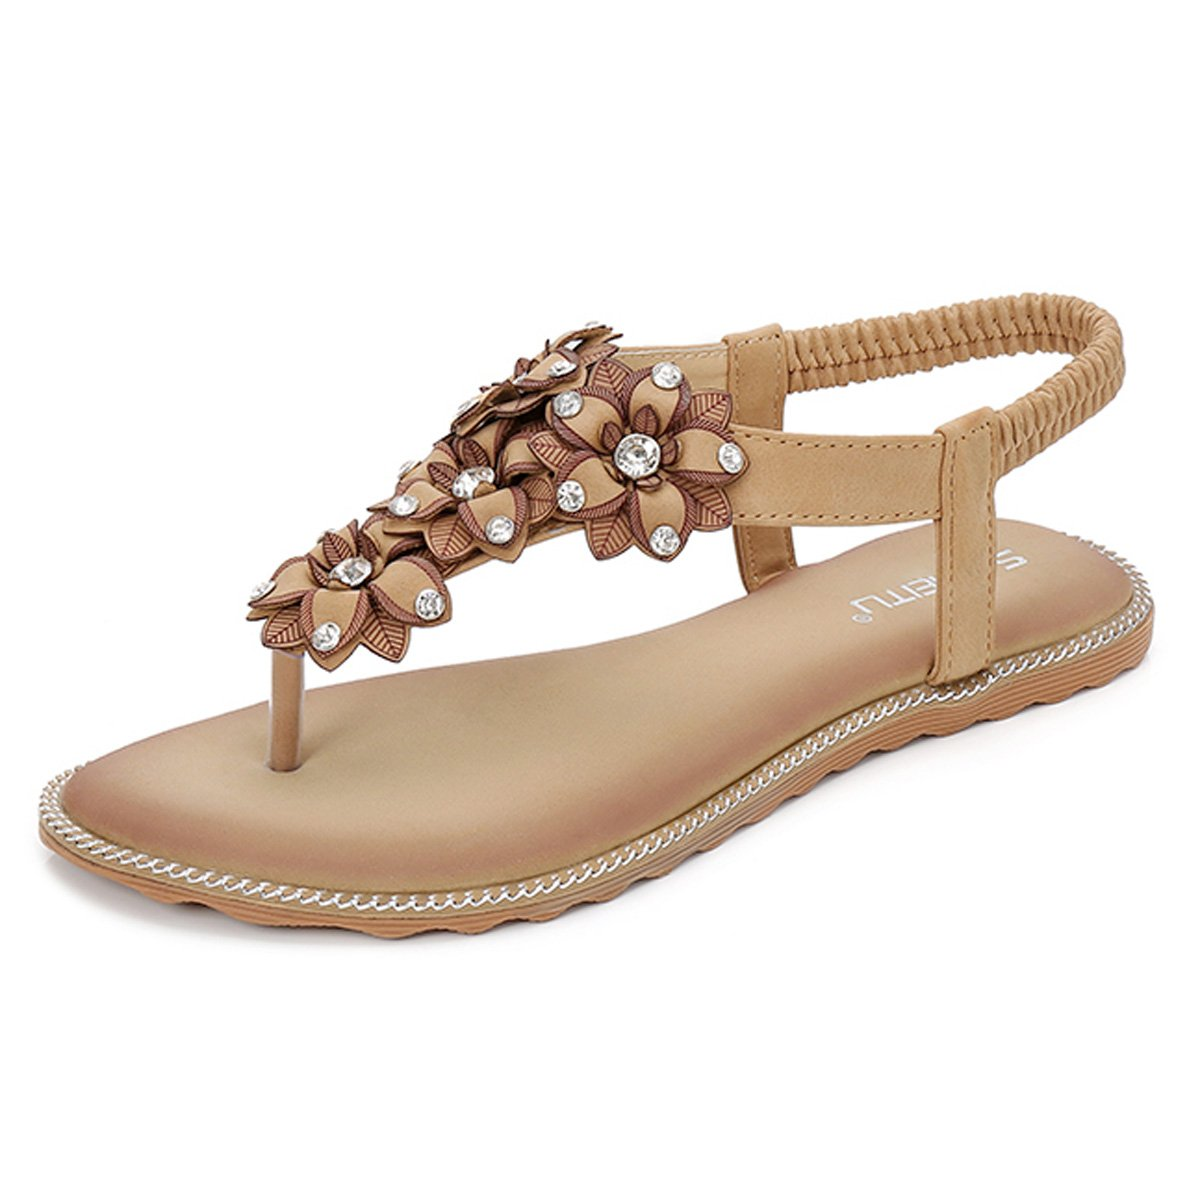 gracosy Damen Sandalen, Flip Flops Sommer Sandals Flach Zehentrenner T-Strap Offen Bouml;hmische Strand Schuhe  38 EU|Beige